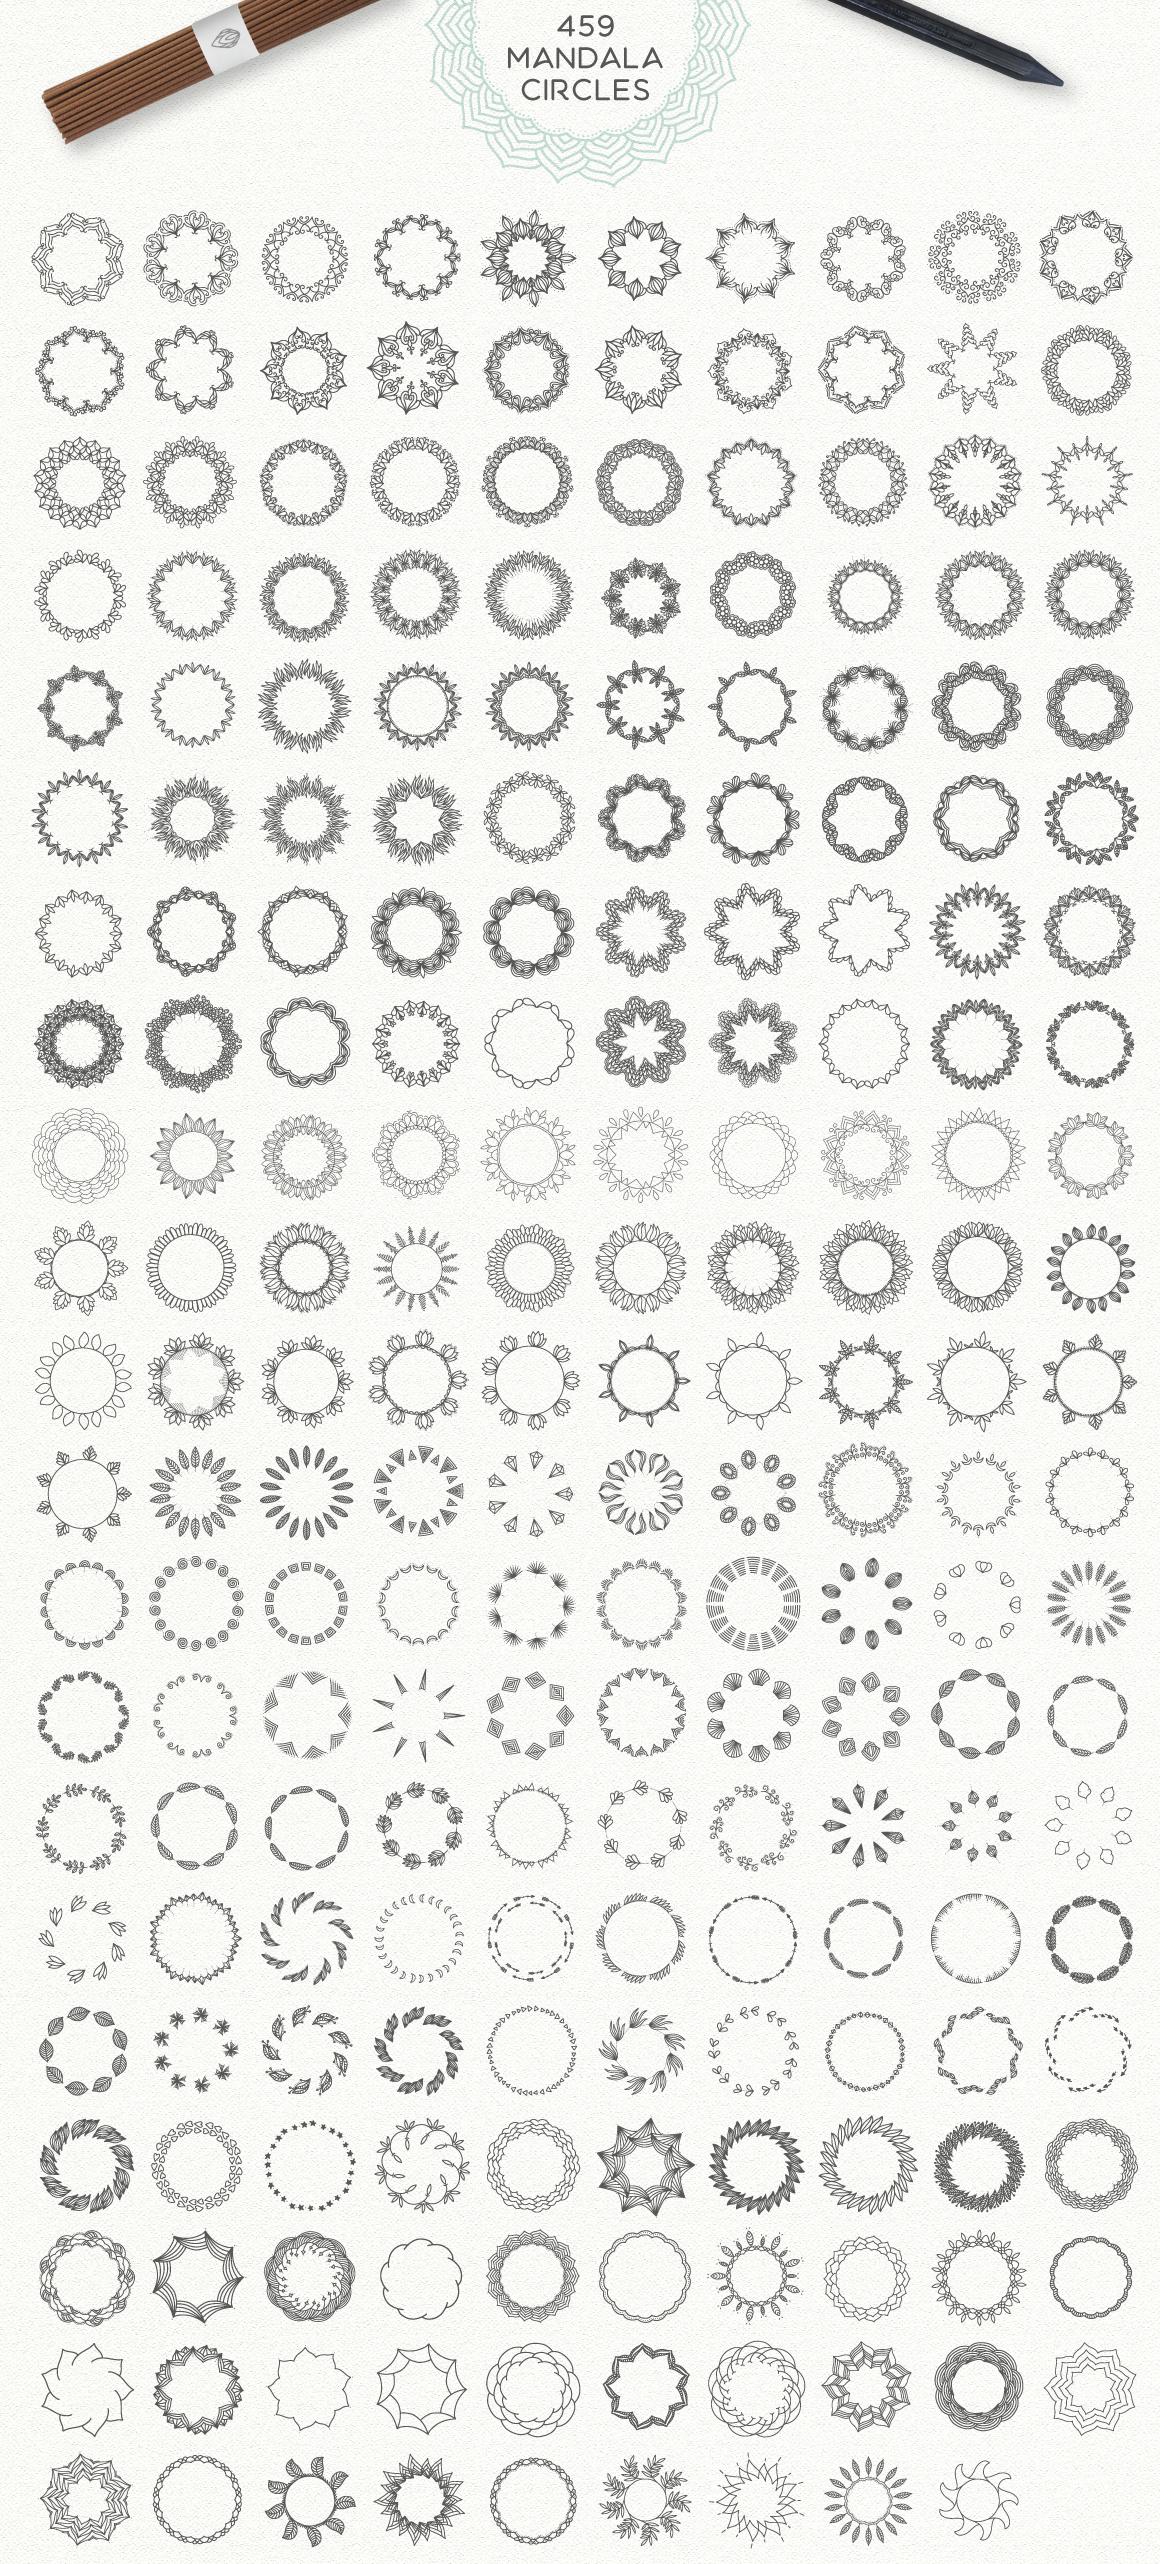 Mandala Collection [630 Elements] example image 4